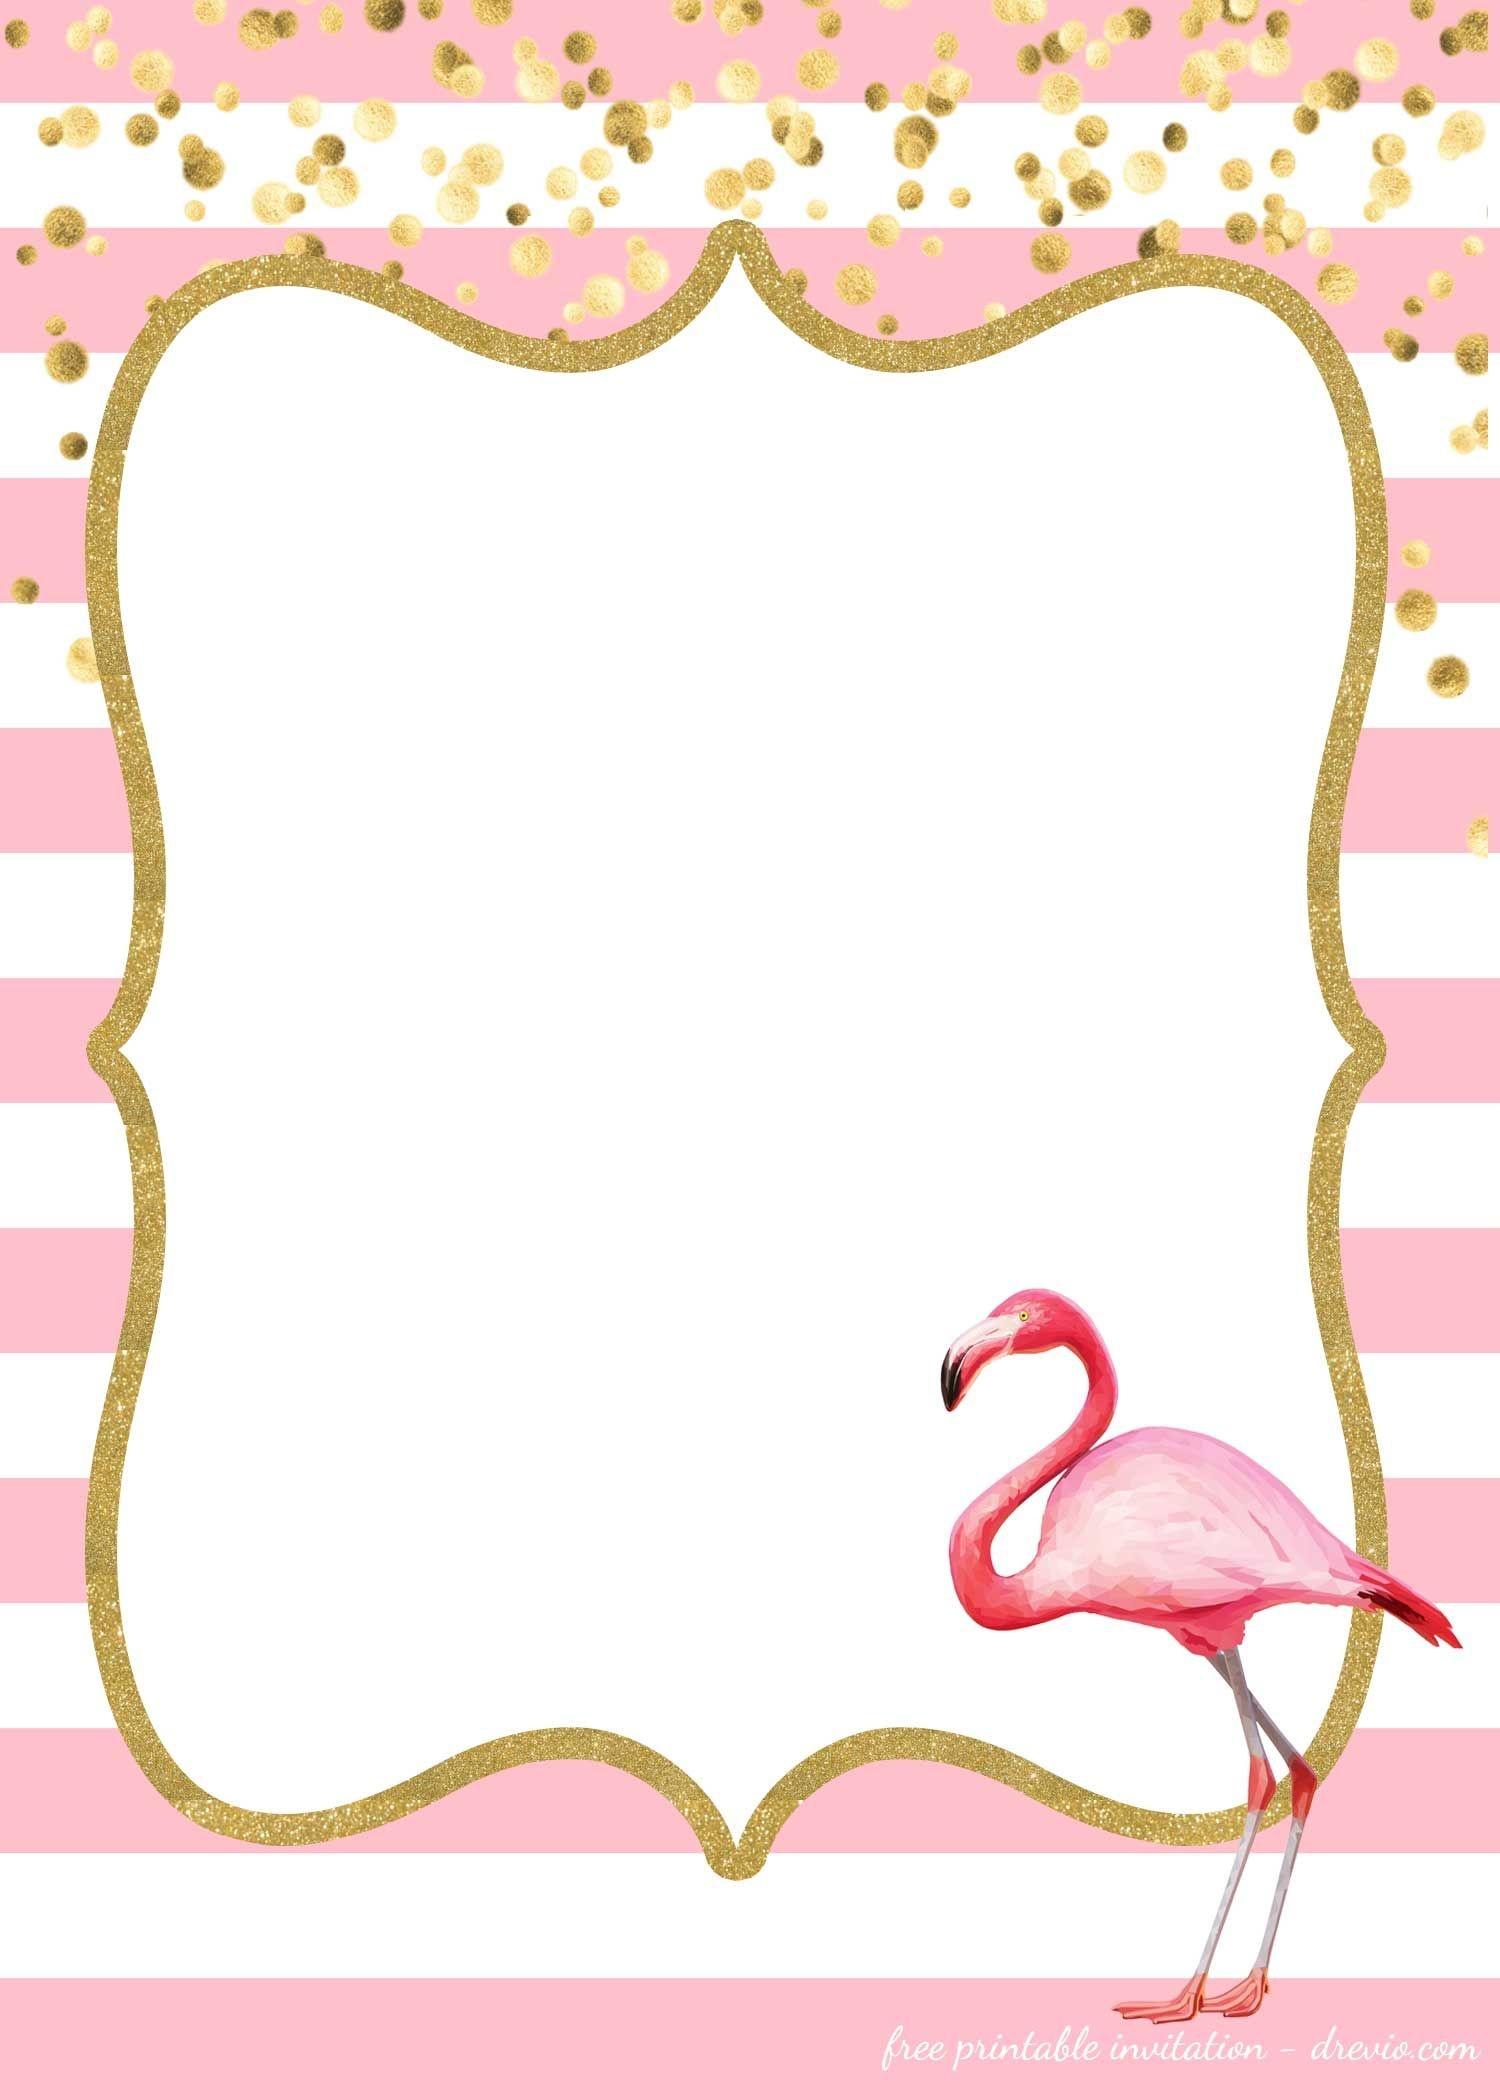 Free Flamingo Invitations Templates - Downloadable   Free Printable - Printable Invitation Templates Free Download